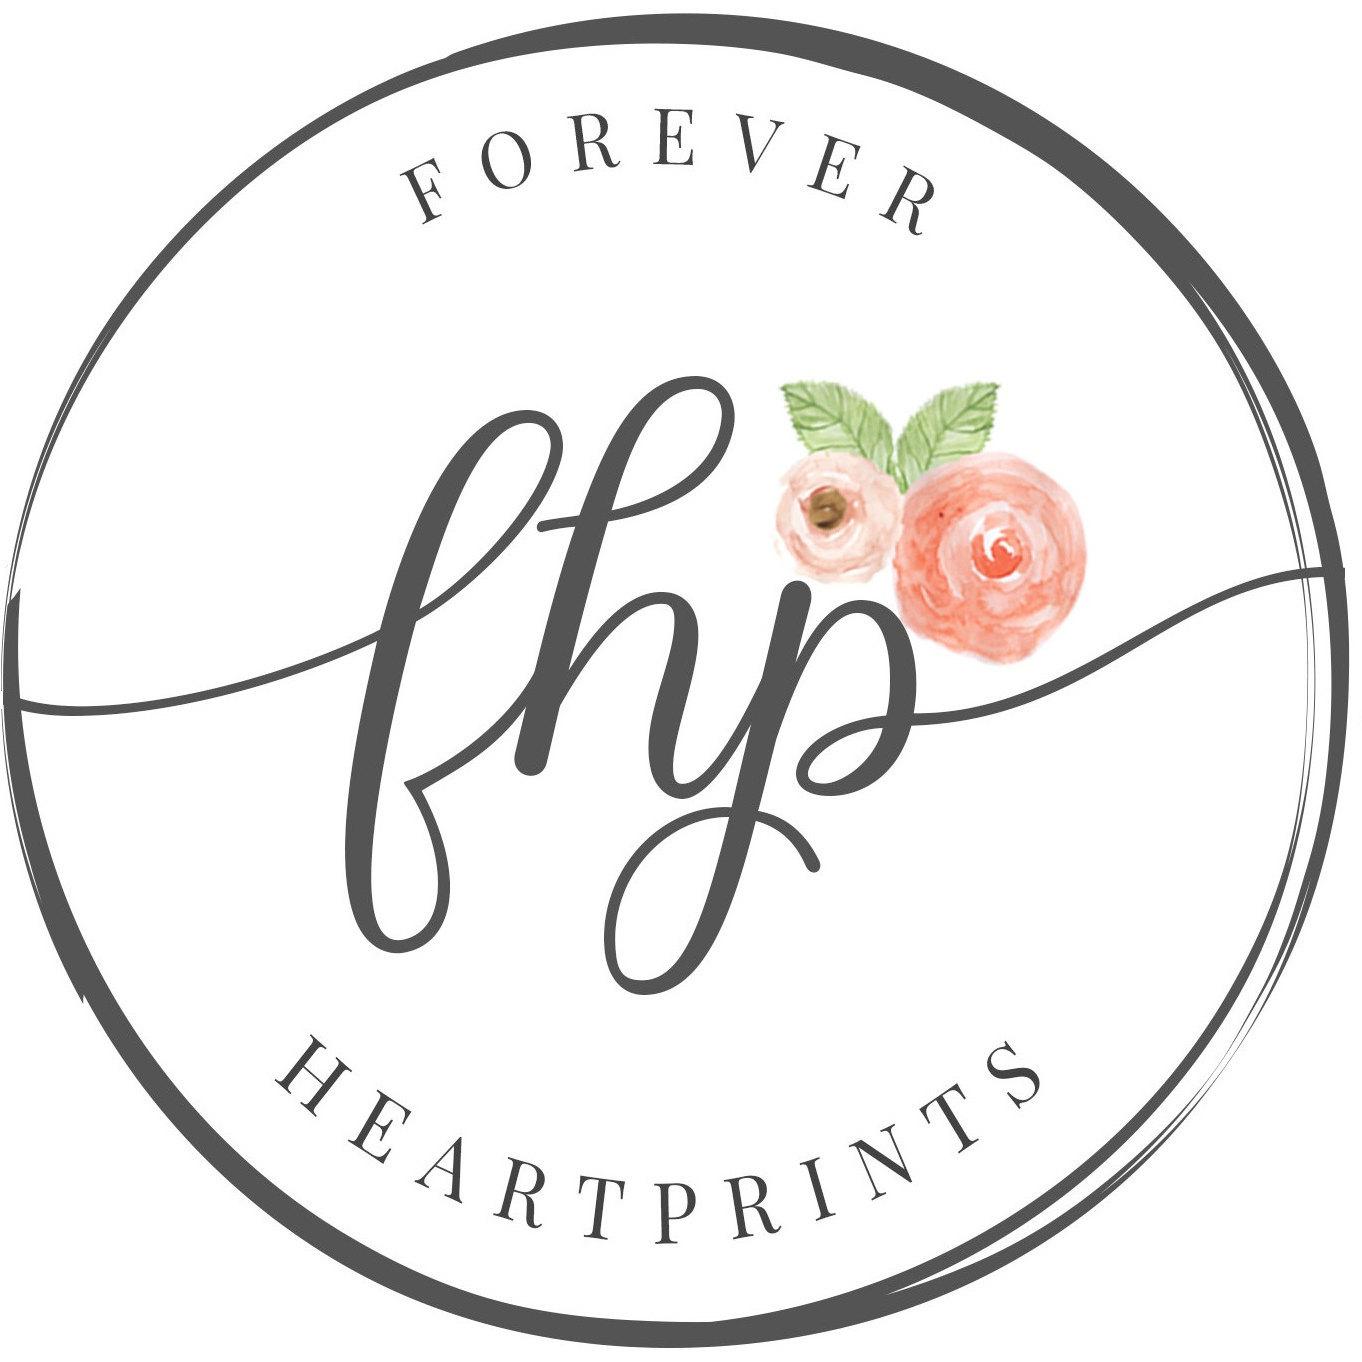 Personalized Hand Stamped Keepsake Jewelry Von ForeverHeartPrints